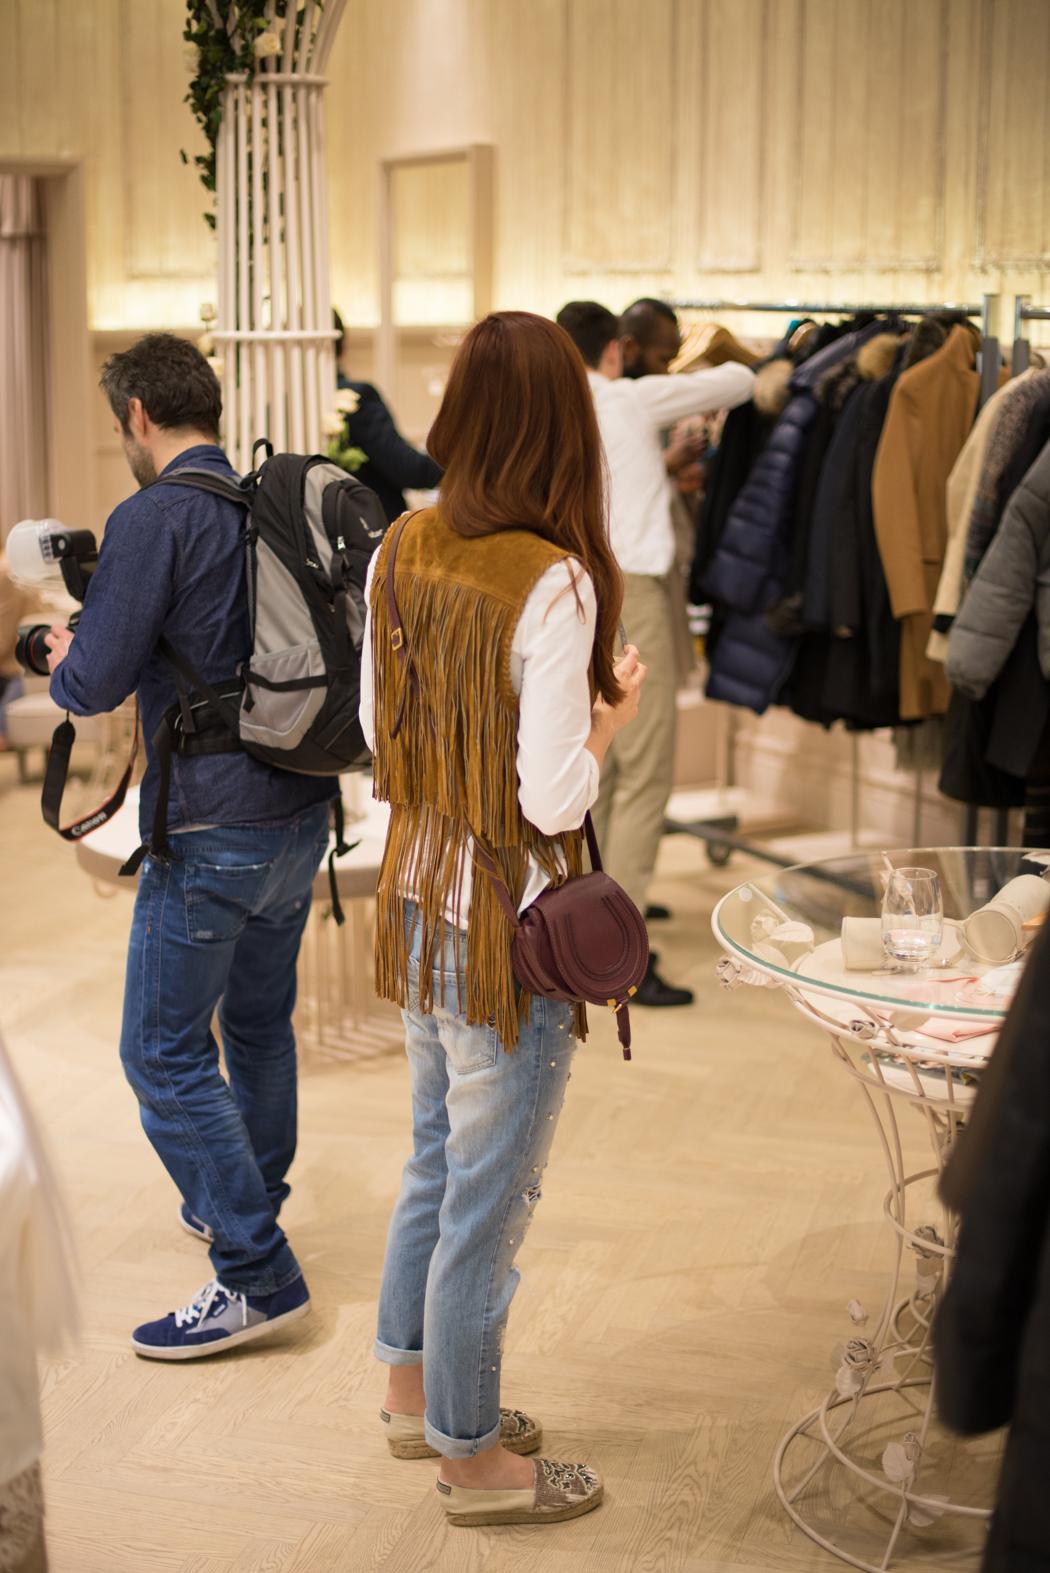 Twin-Set-Opening-München-Store-Munich-Monaco-Simona-Barbieri-Fashionblogger-München-Fashionblog-Deutschland-Blog-Lifestyle-Lindarella-4